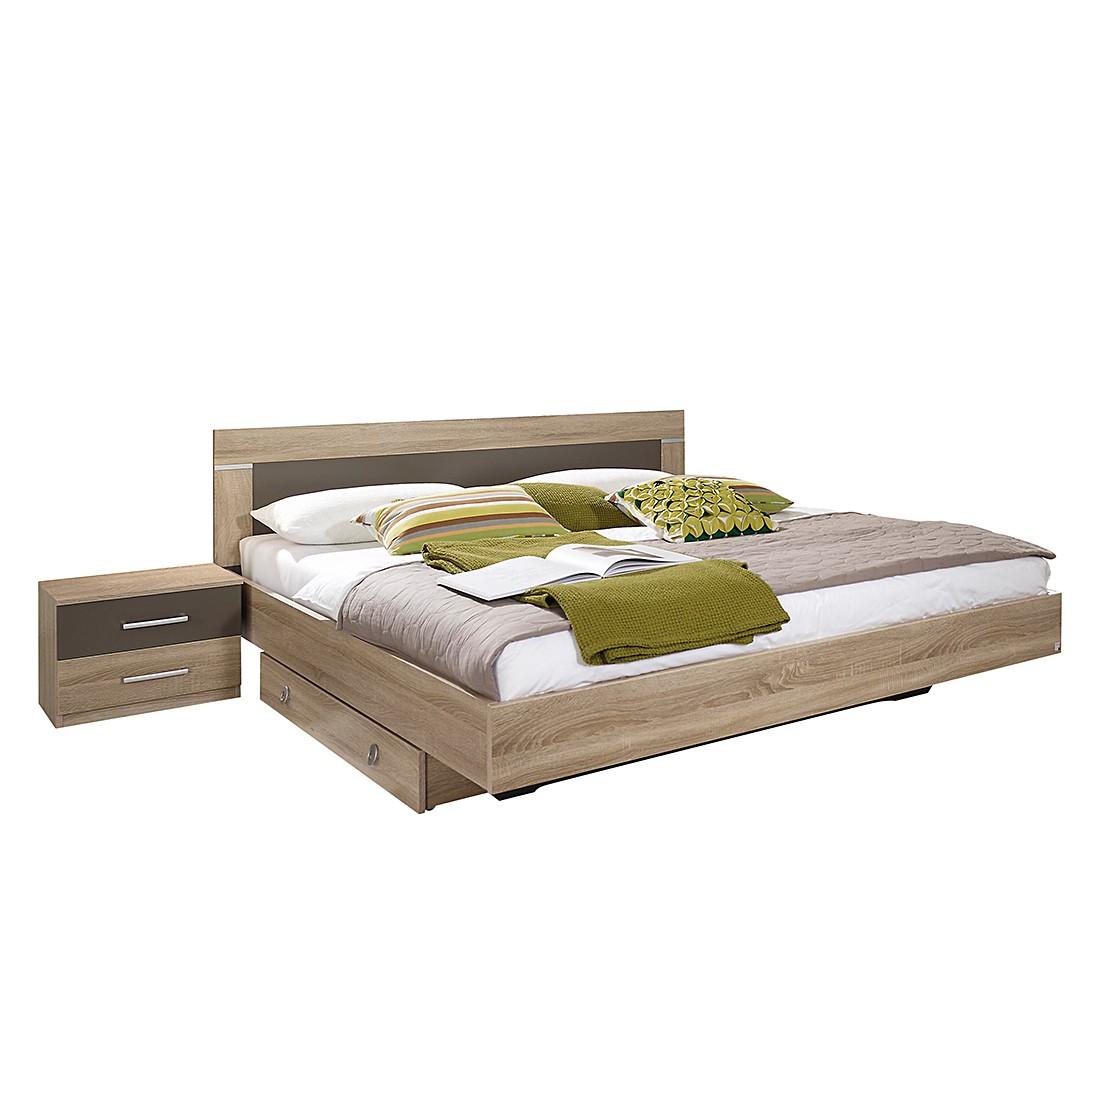 Bed Venlo (3-delig) - 180 x 200cm - Geen bedlade - Sonoma eikenhouten look/lavakleurig, Rauch Packs